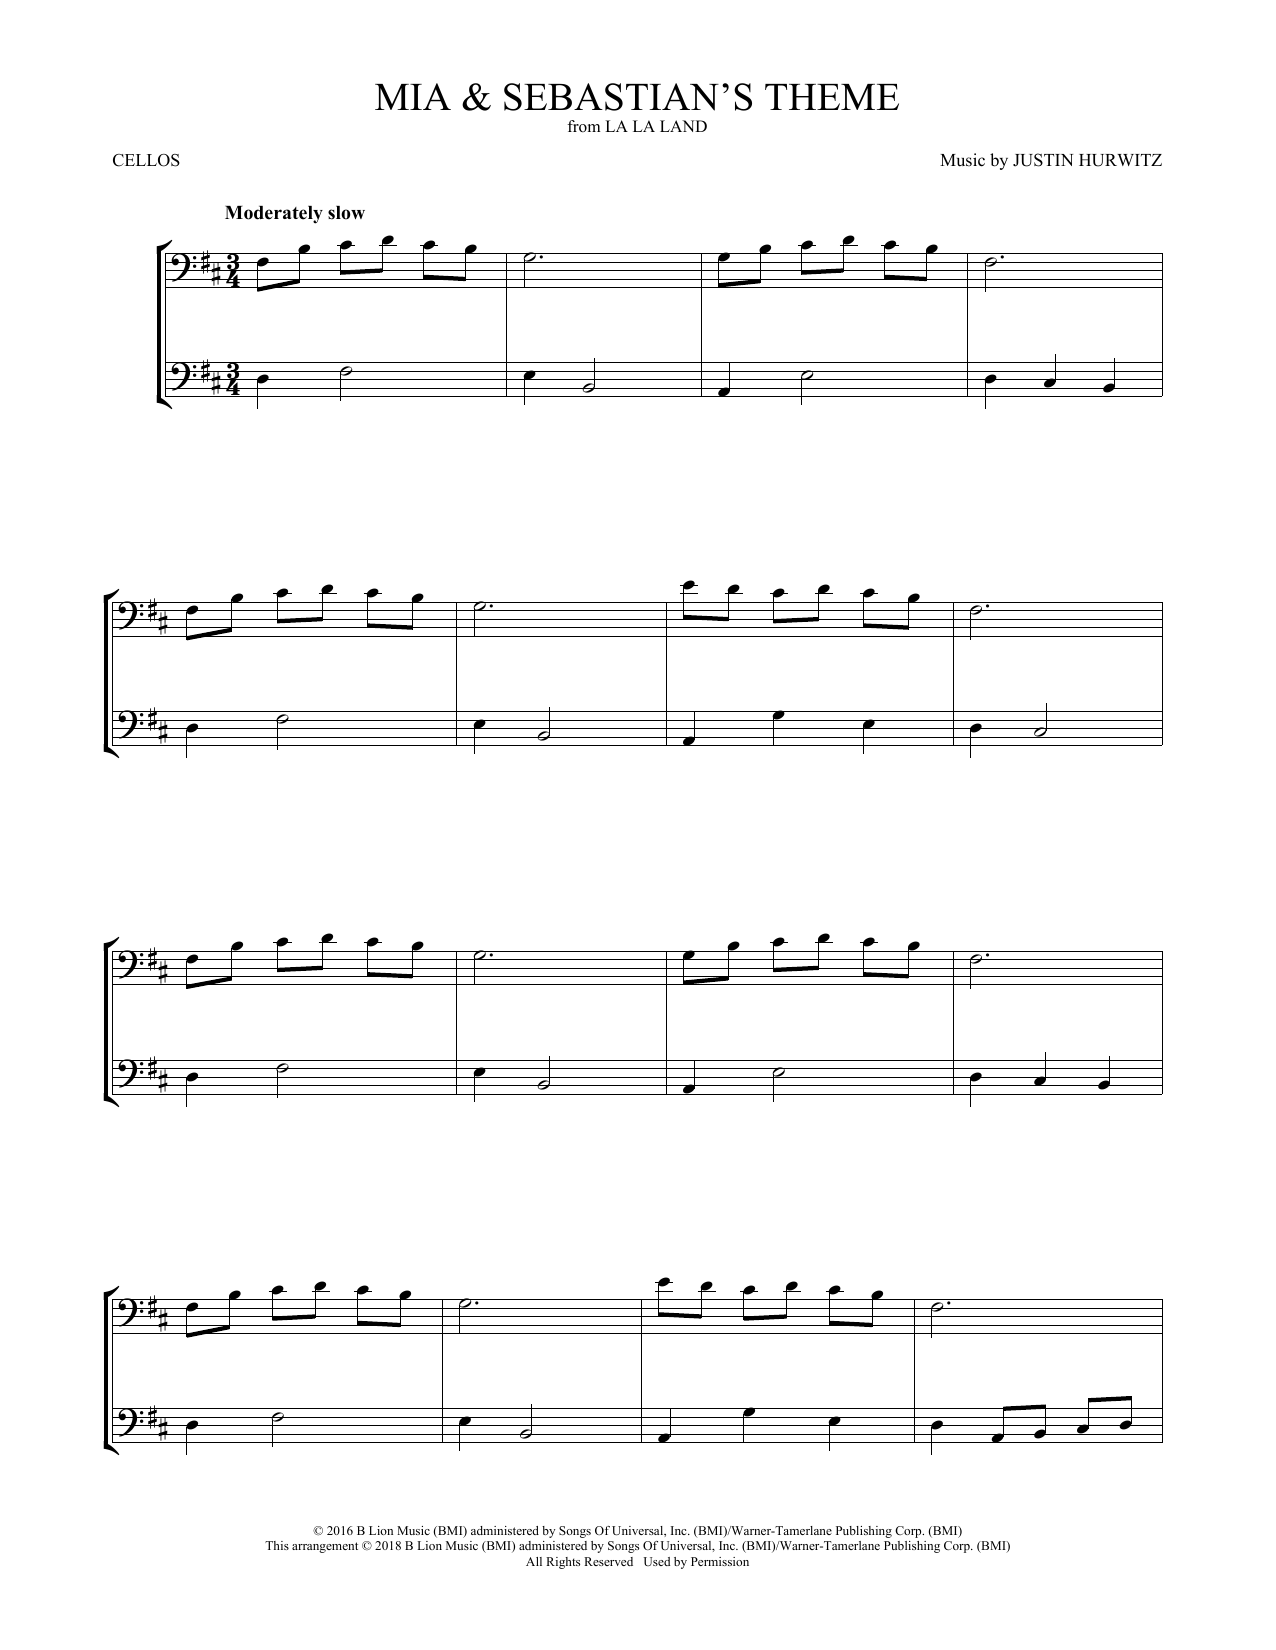 Mia & Sebastian's Theme (from La La Land) (Cello Duet)